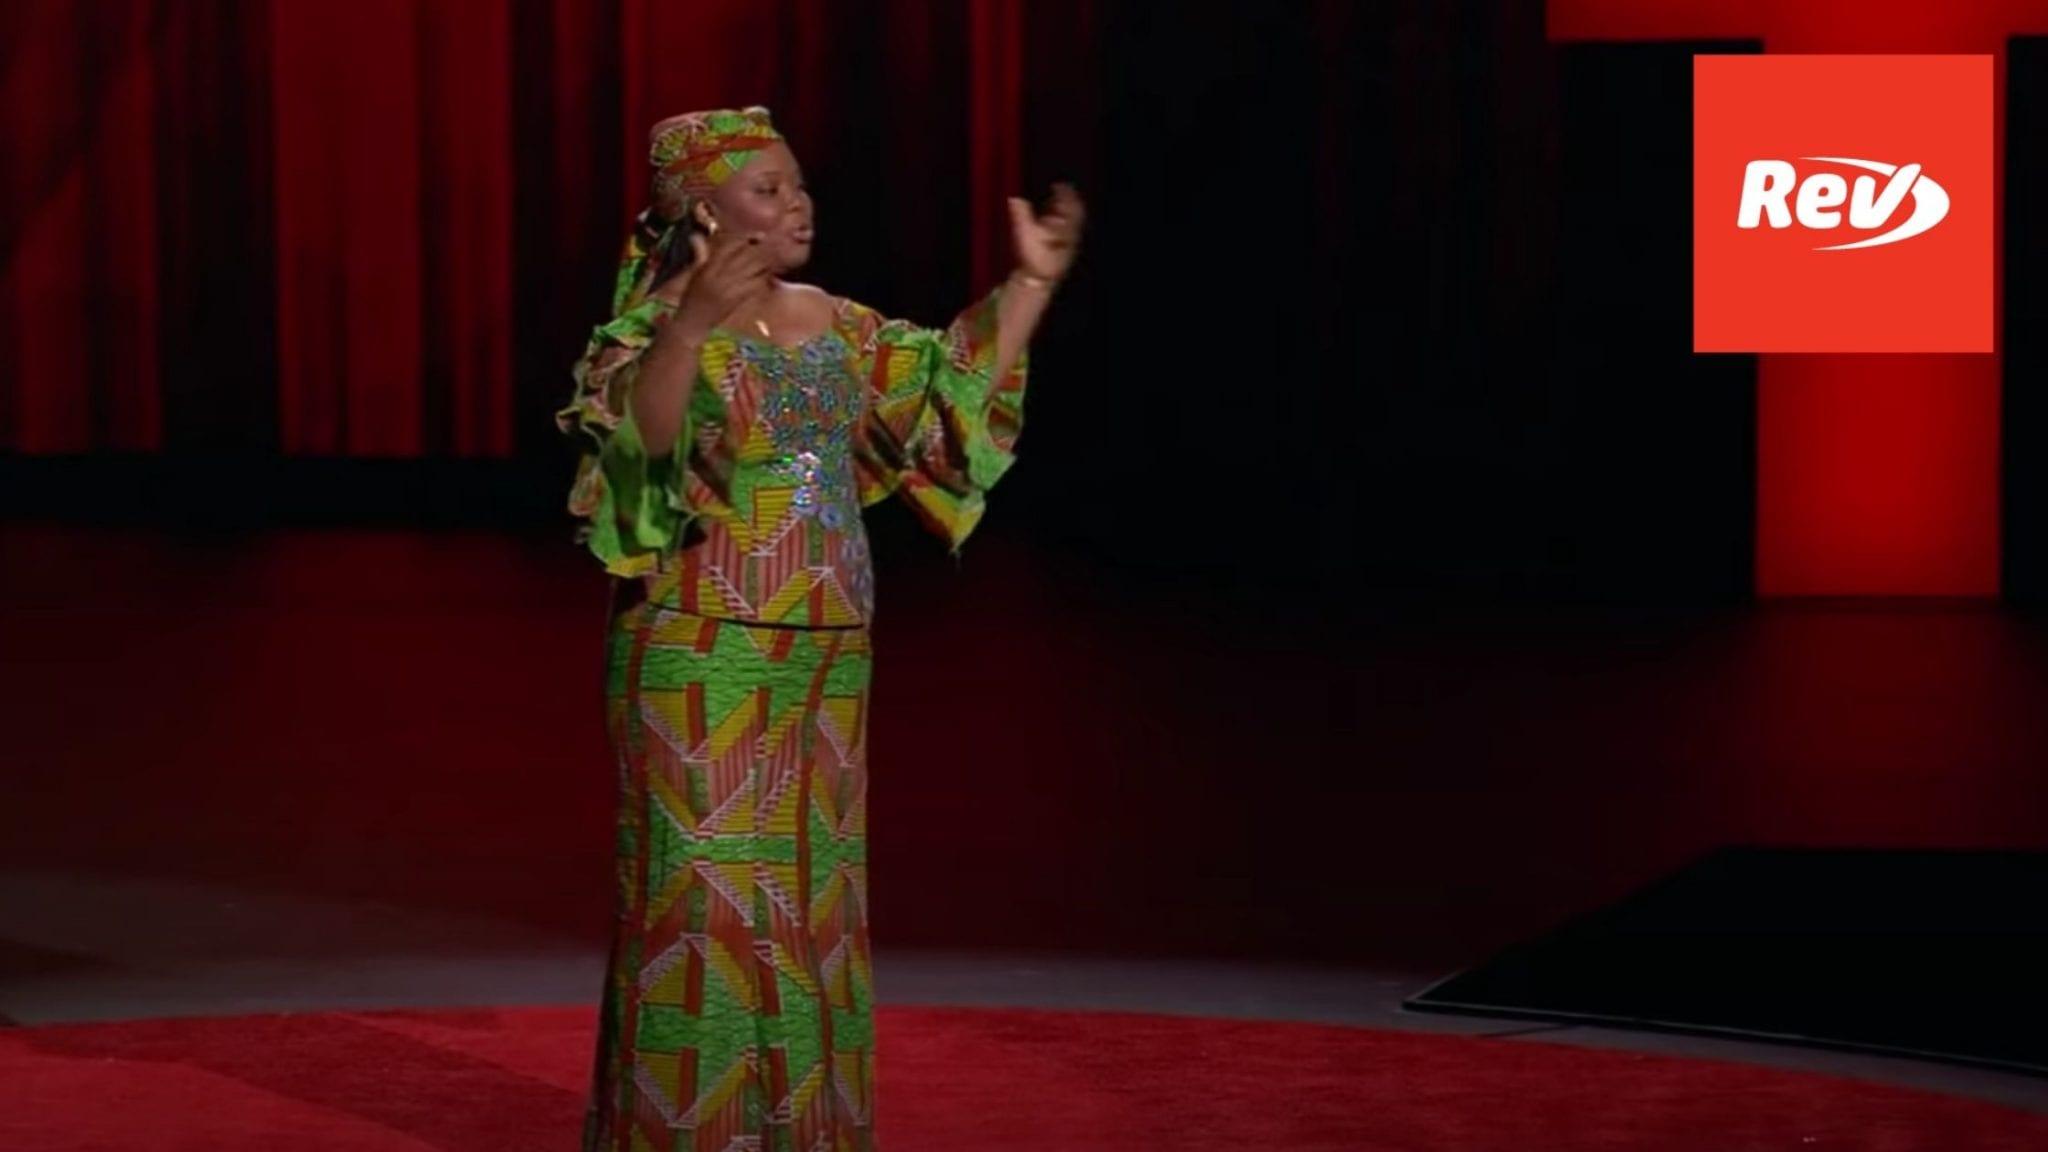 Leymah Gbowee Ted Talk Speech Transcript: Unlock the Intelligence, Passion, Greatness of Girls